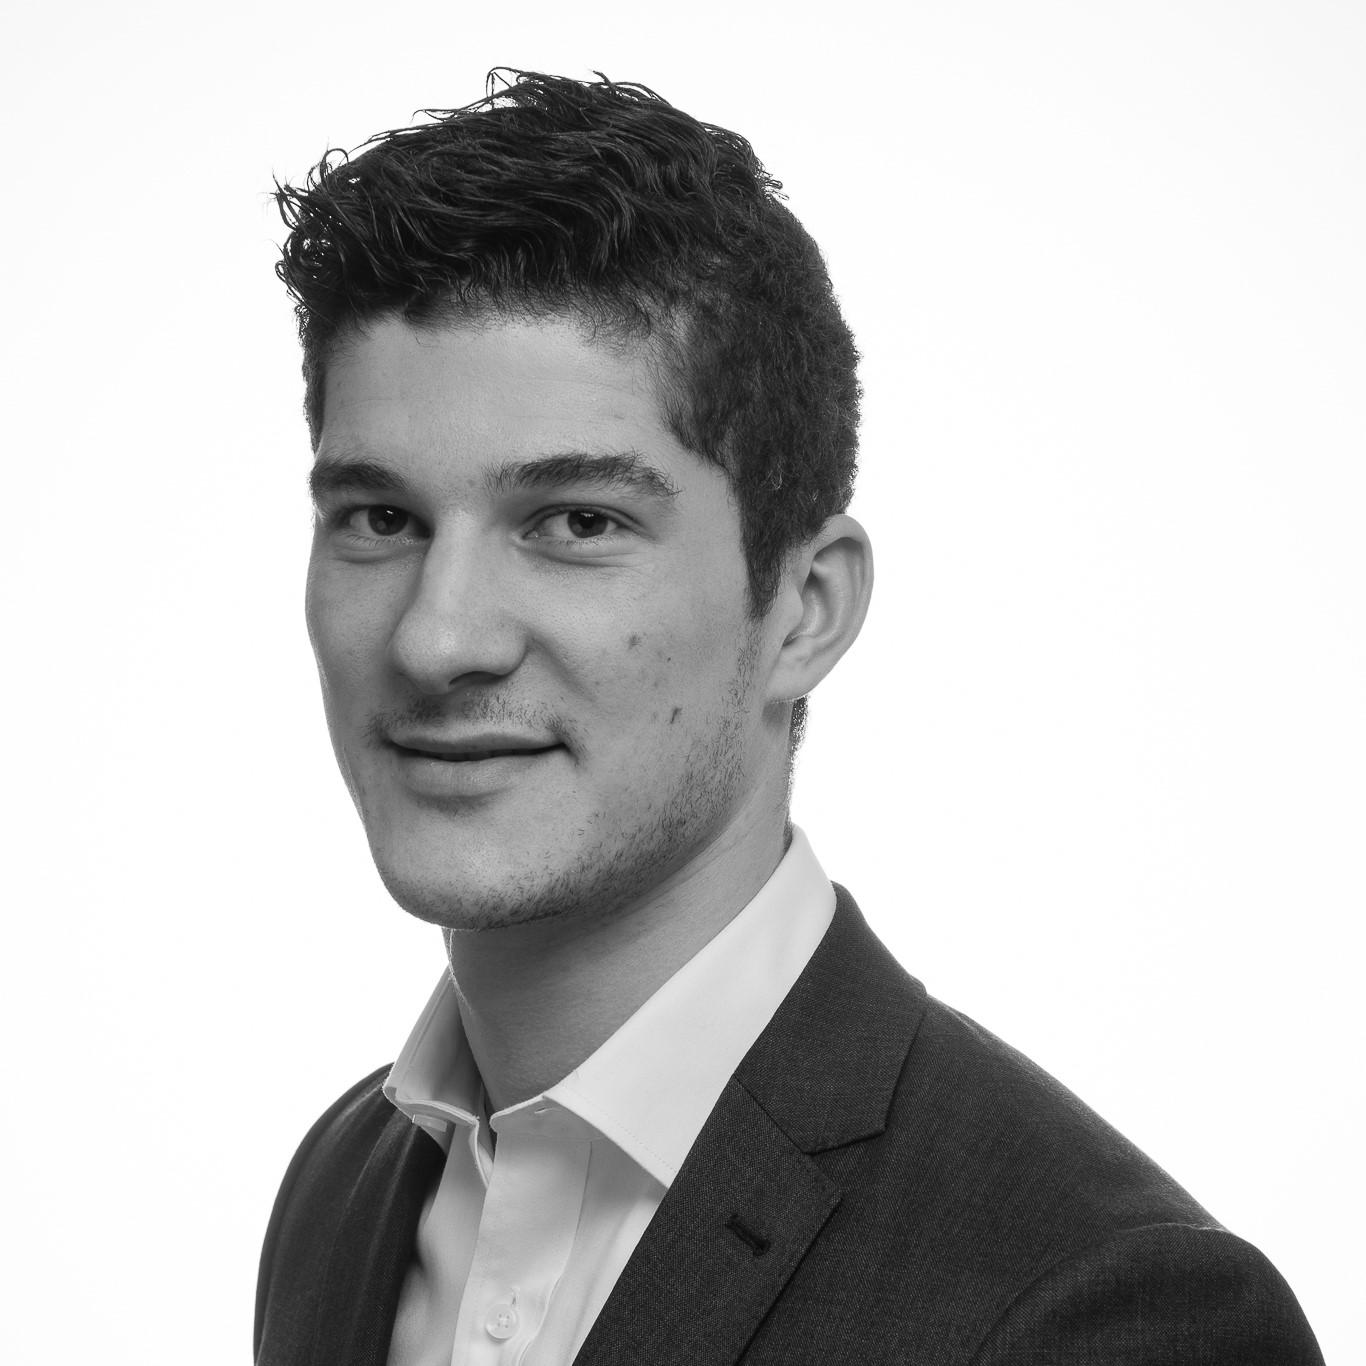 Roberto - Svartvit profil